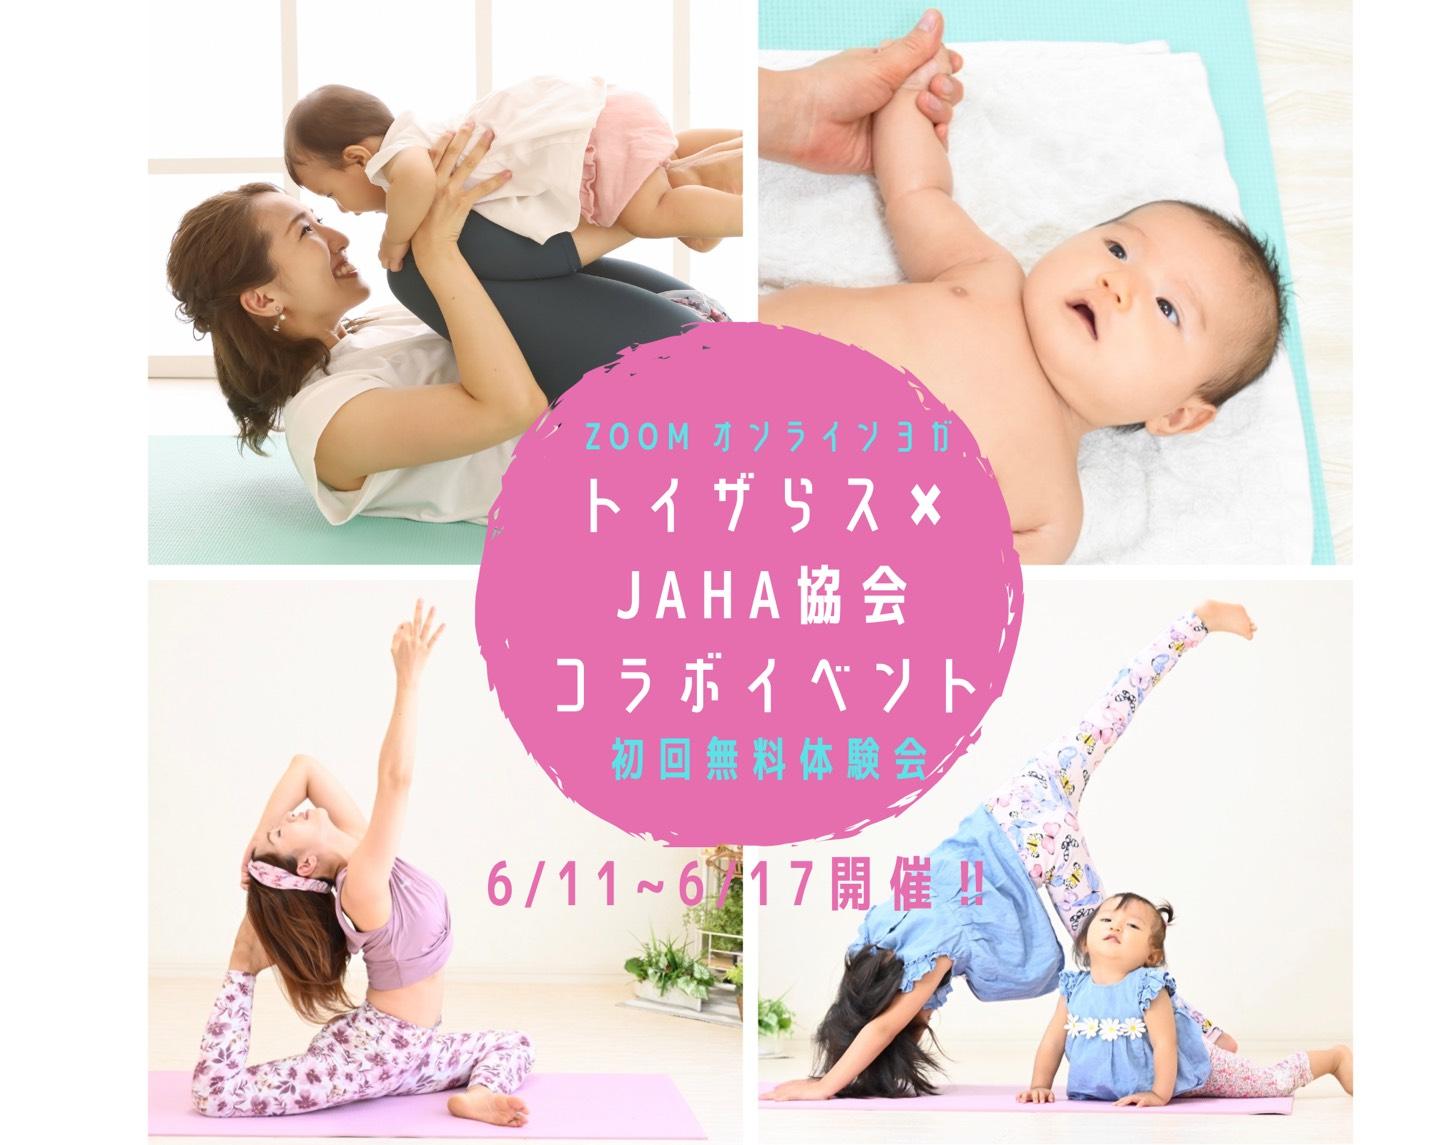 JAHA協会×日本トイザらス、 『初回無料オンラインヨ…の画像